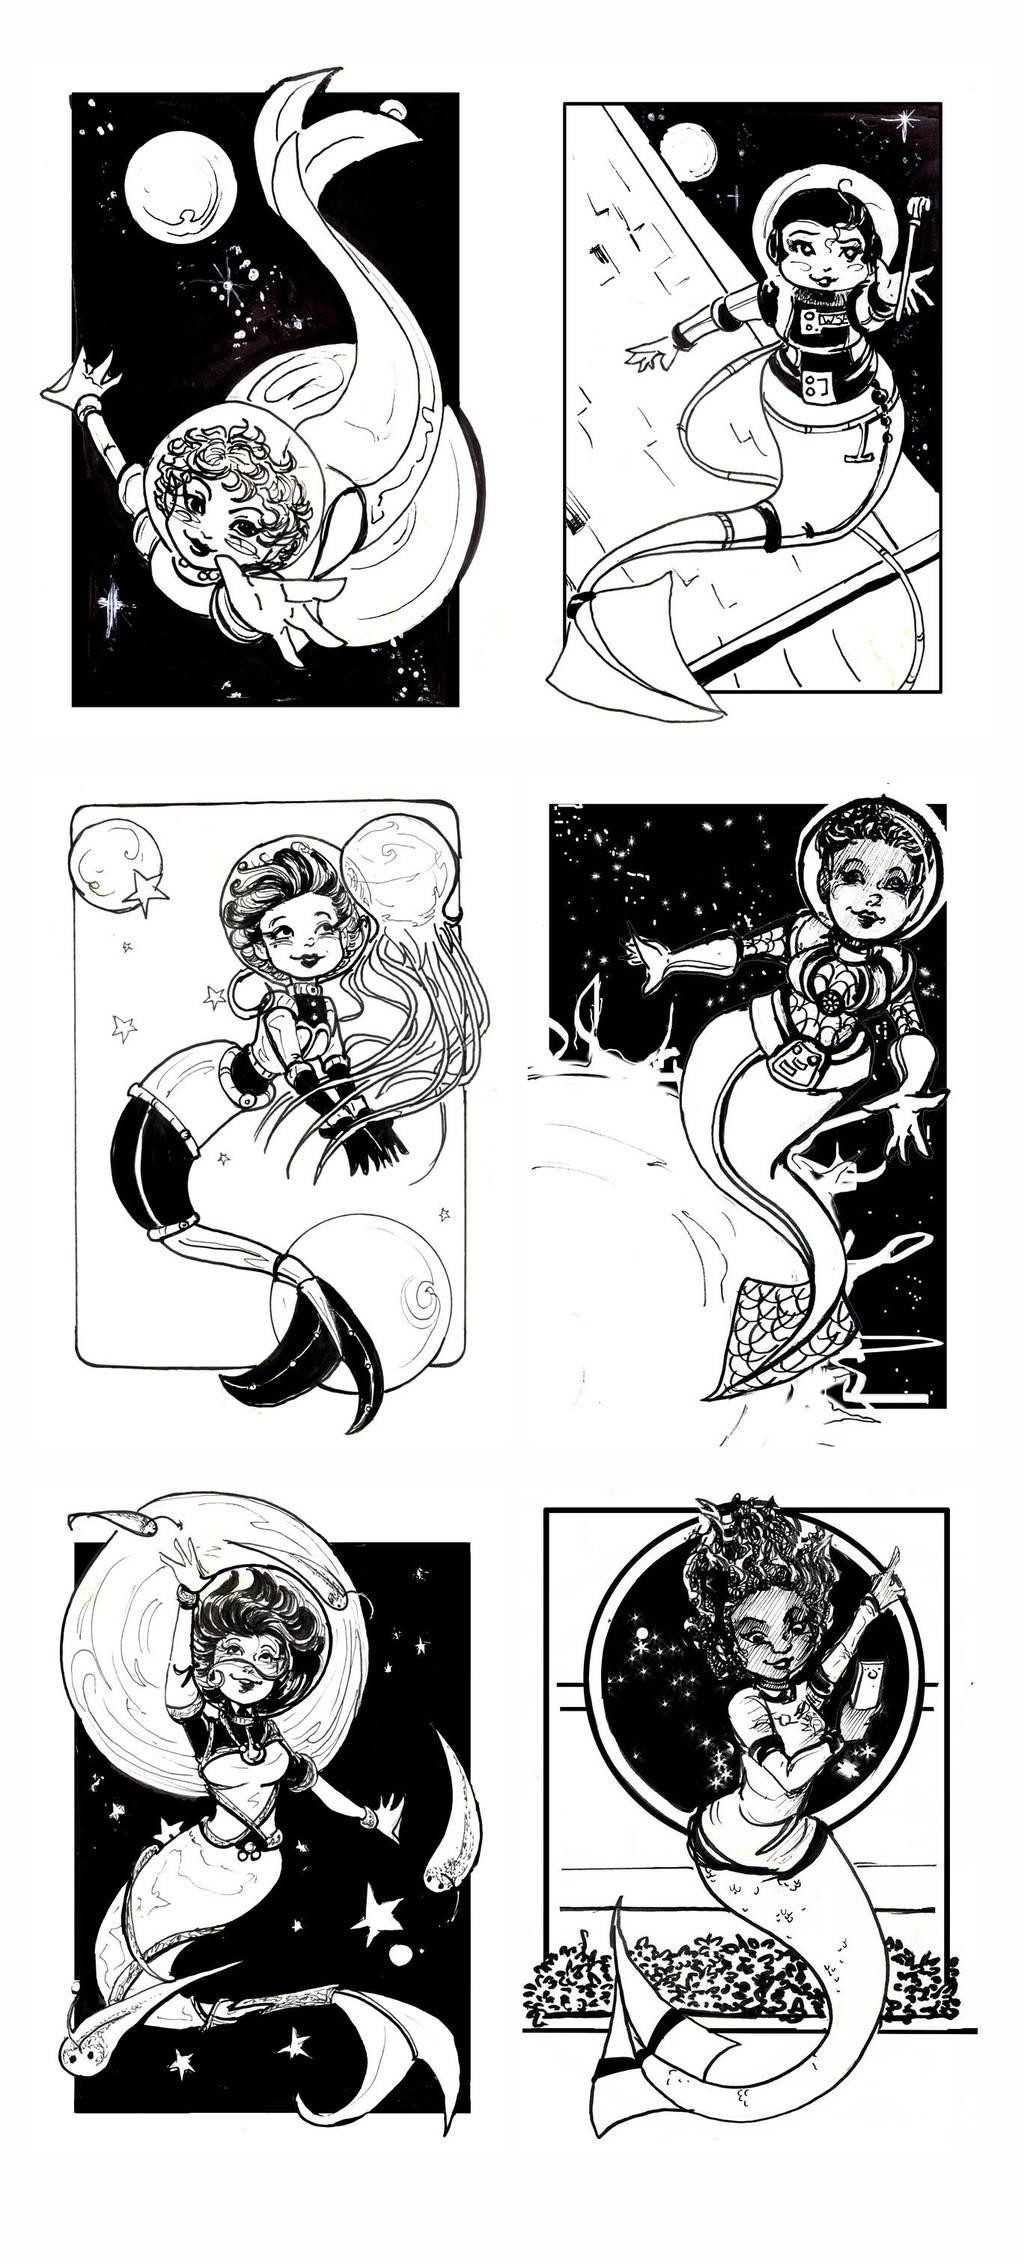 Space Mermaids 2016 by GalacticDustBunnies